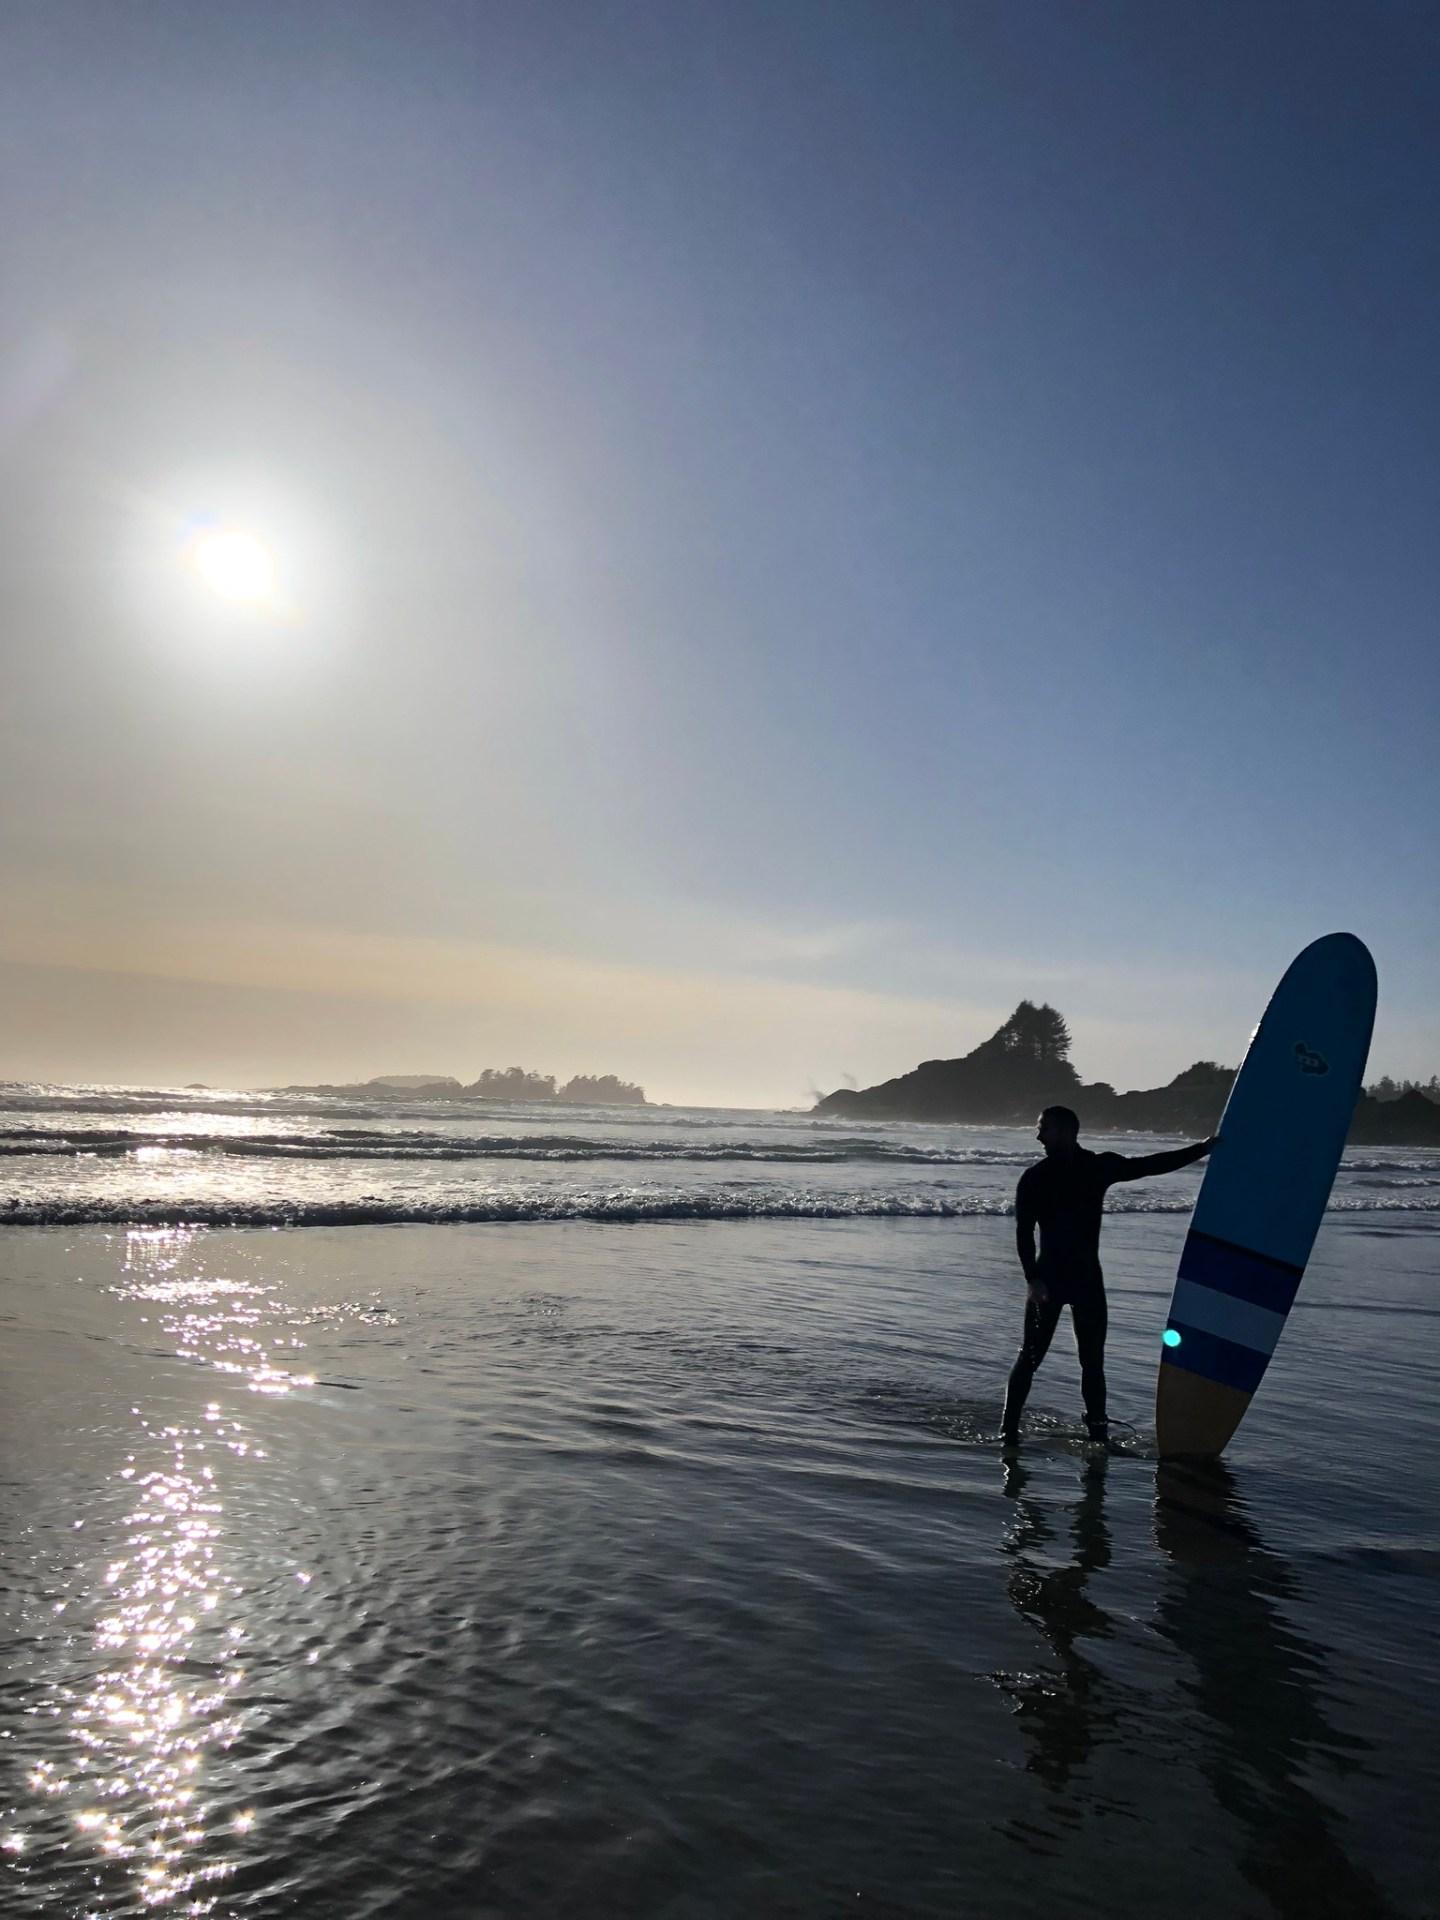 Jordan surfing in Tofino